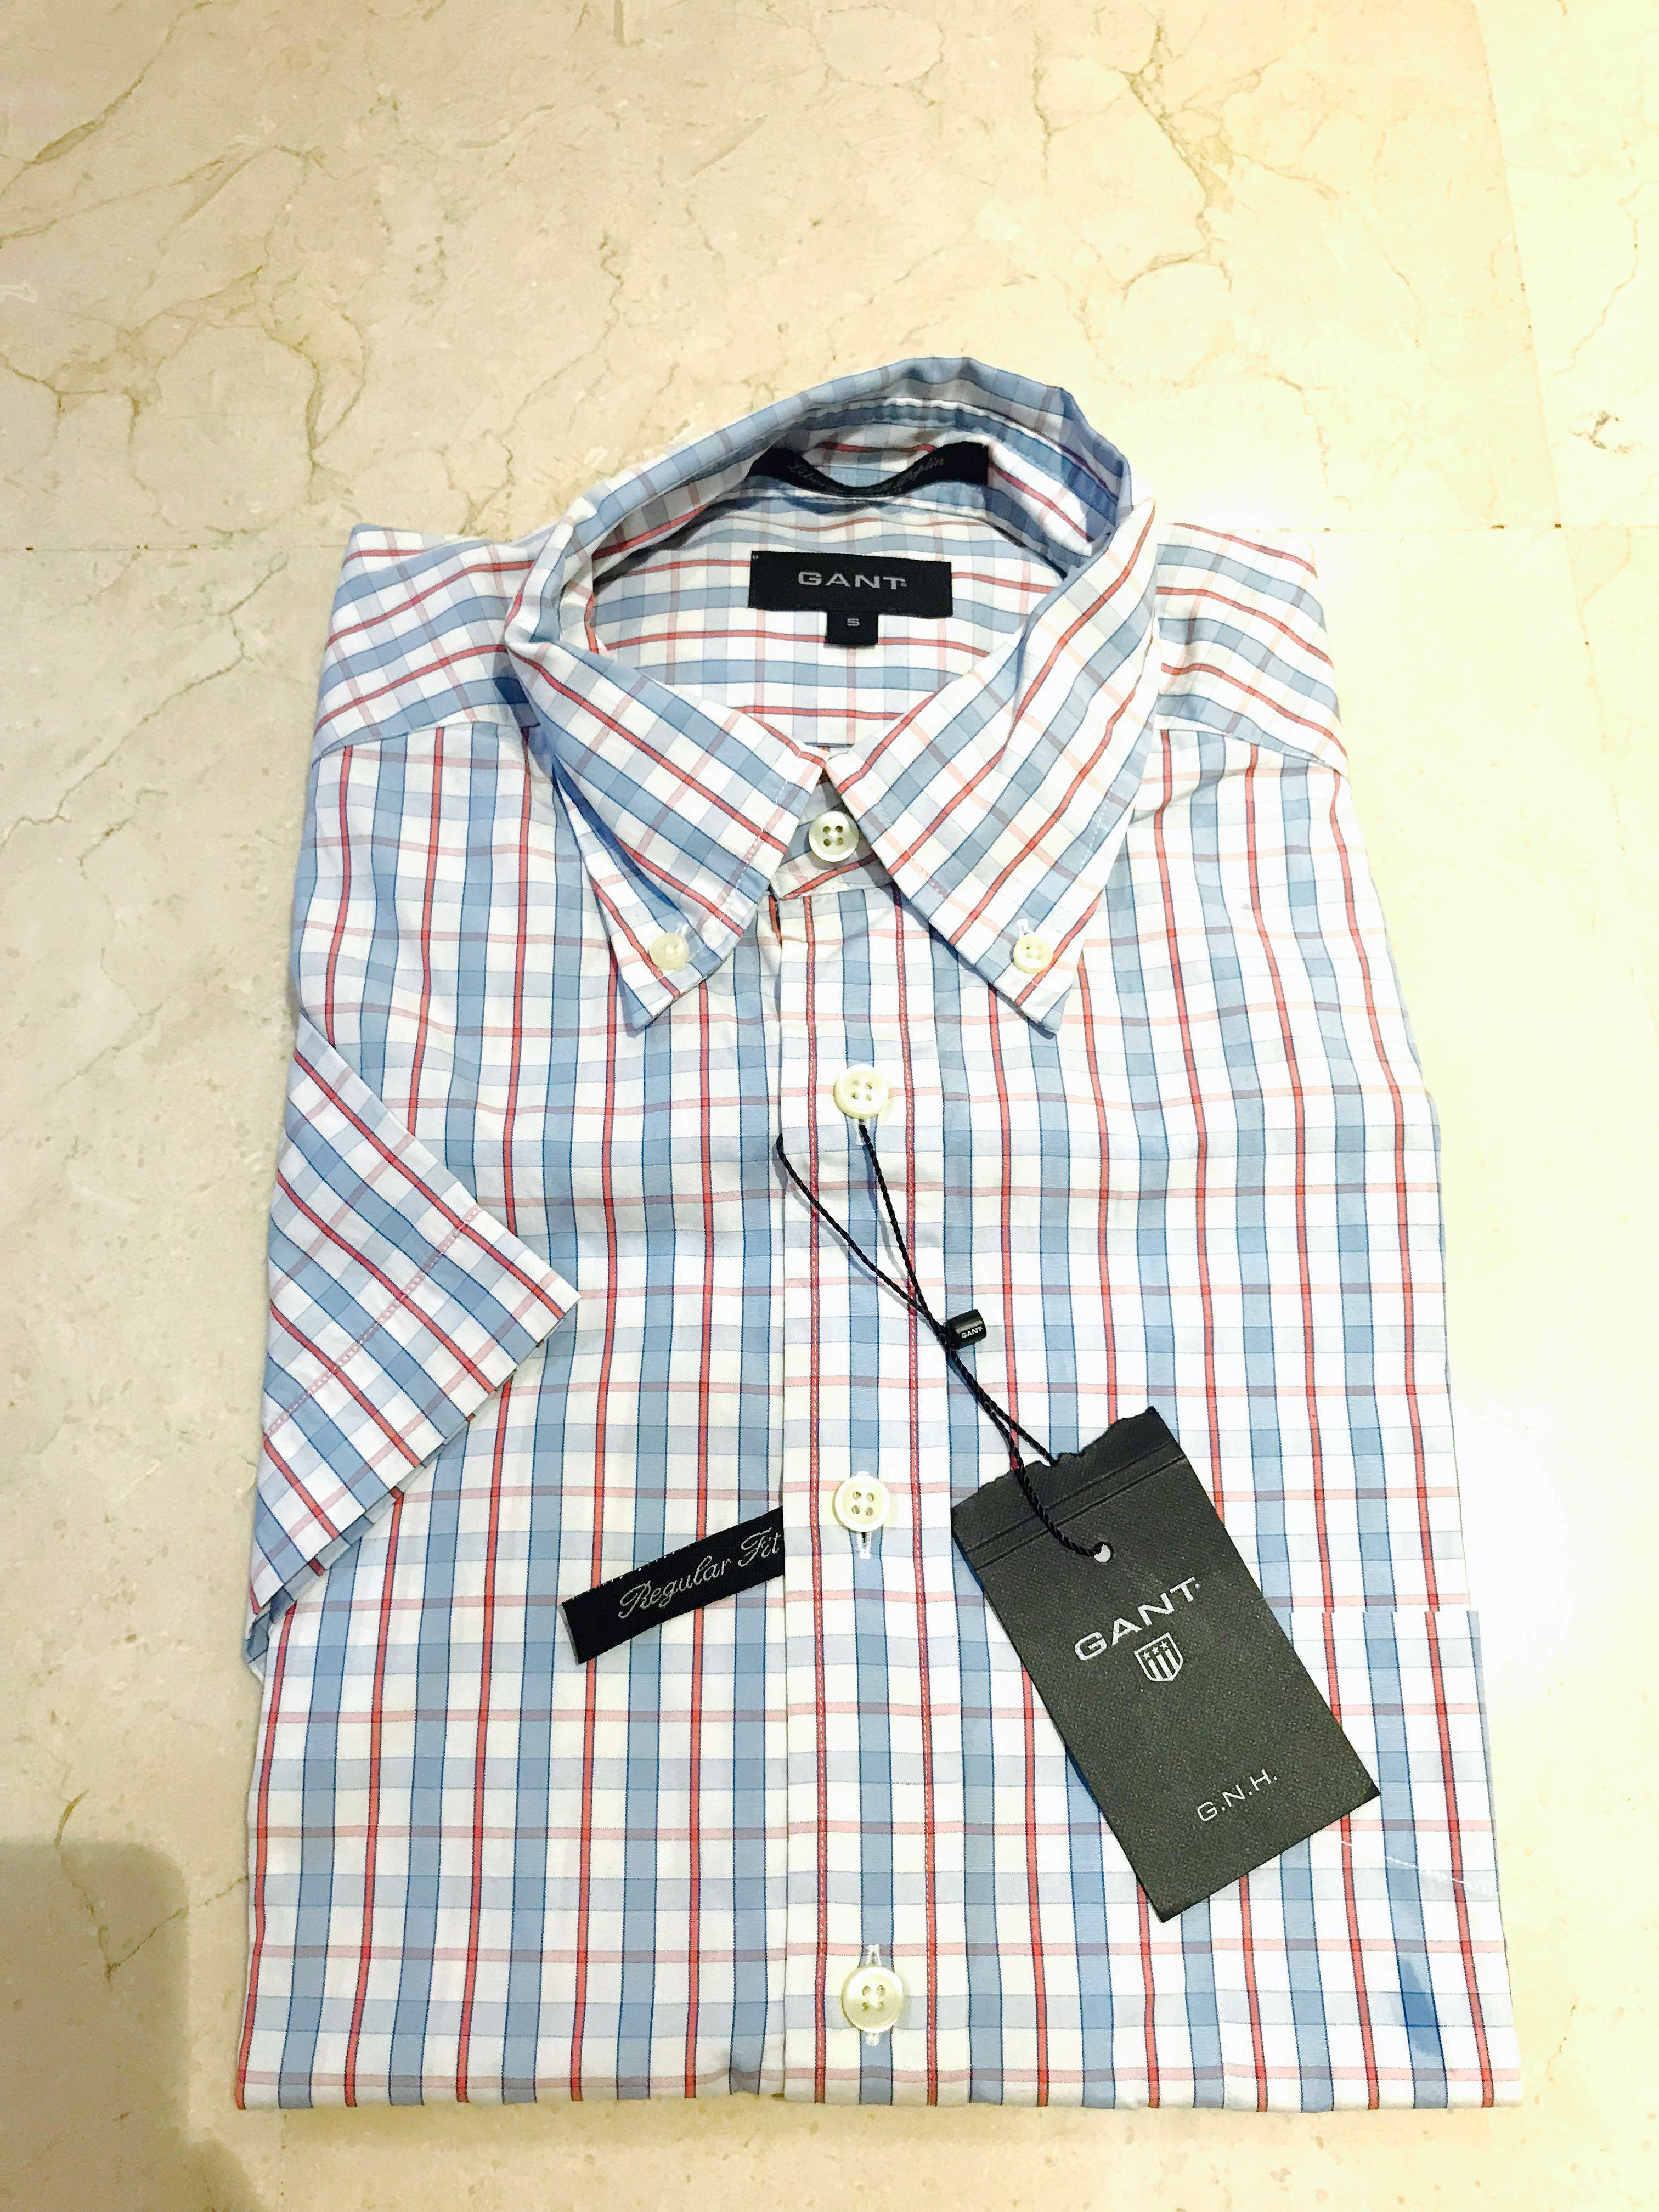 7d38dad69bc Gant Regular Fit Short Sleeve Shirt, Men's Fashion, Clothes, Tops on ...